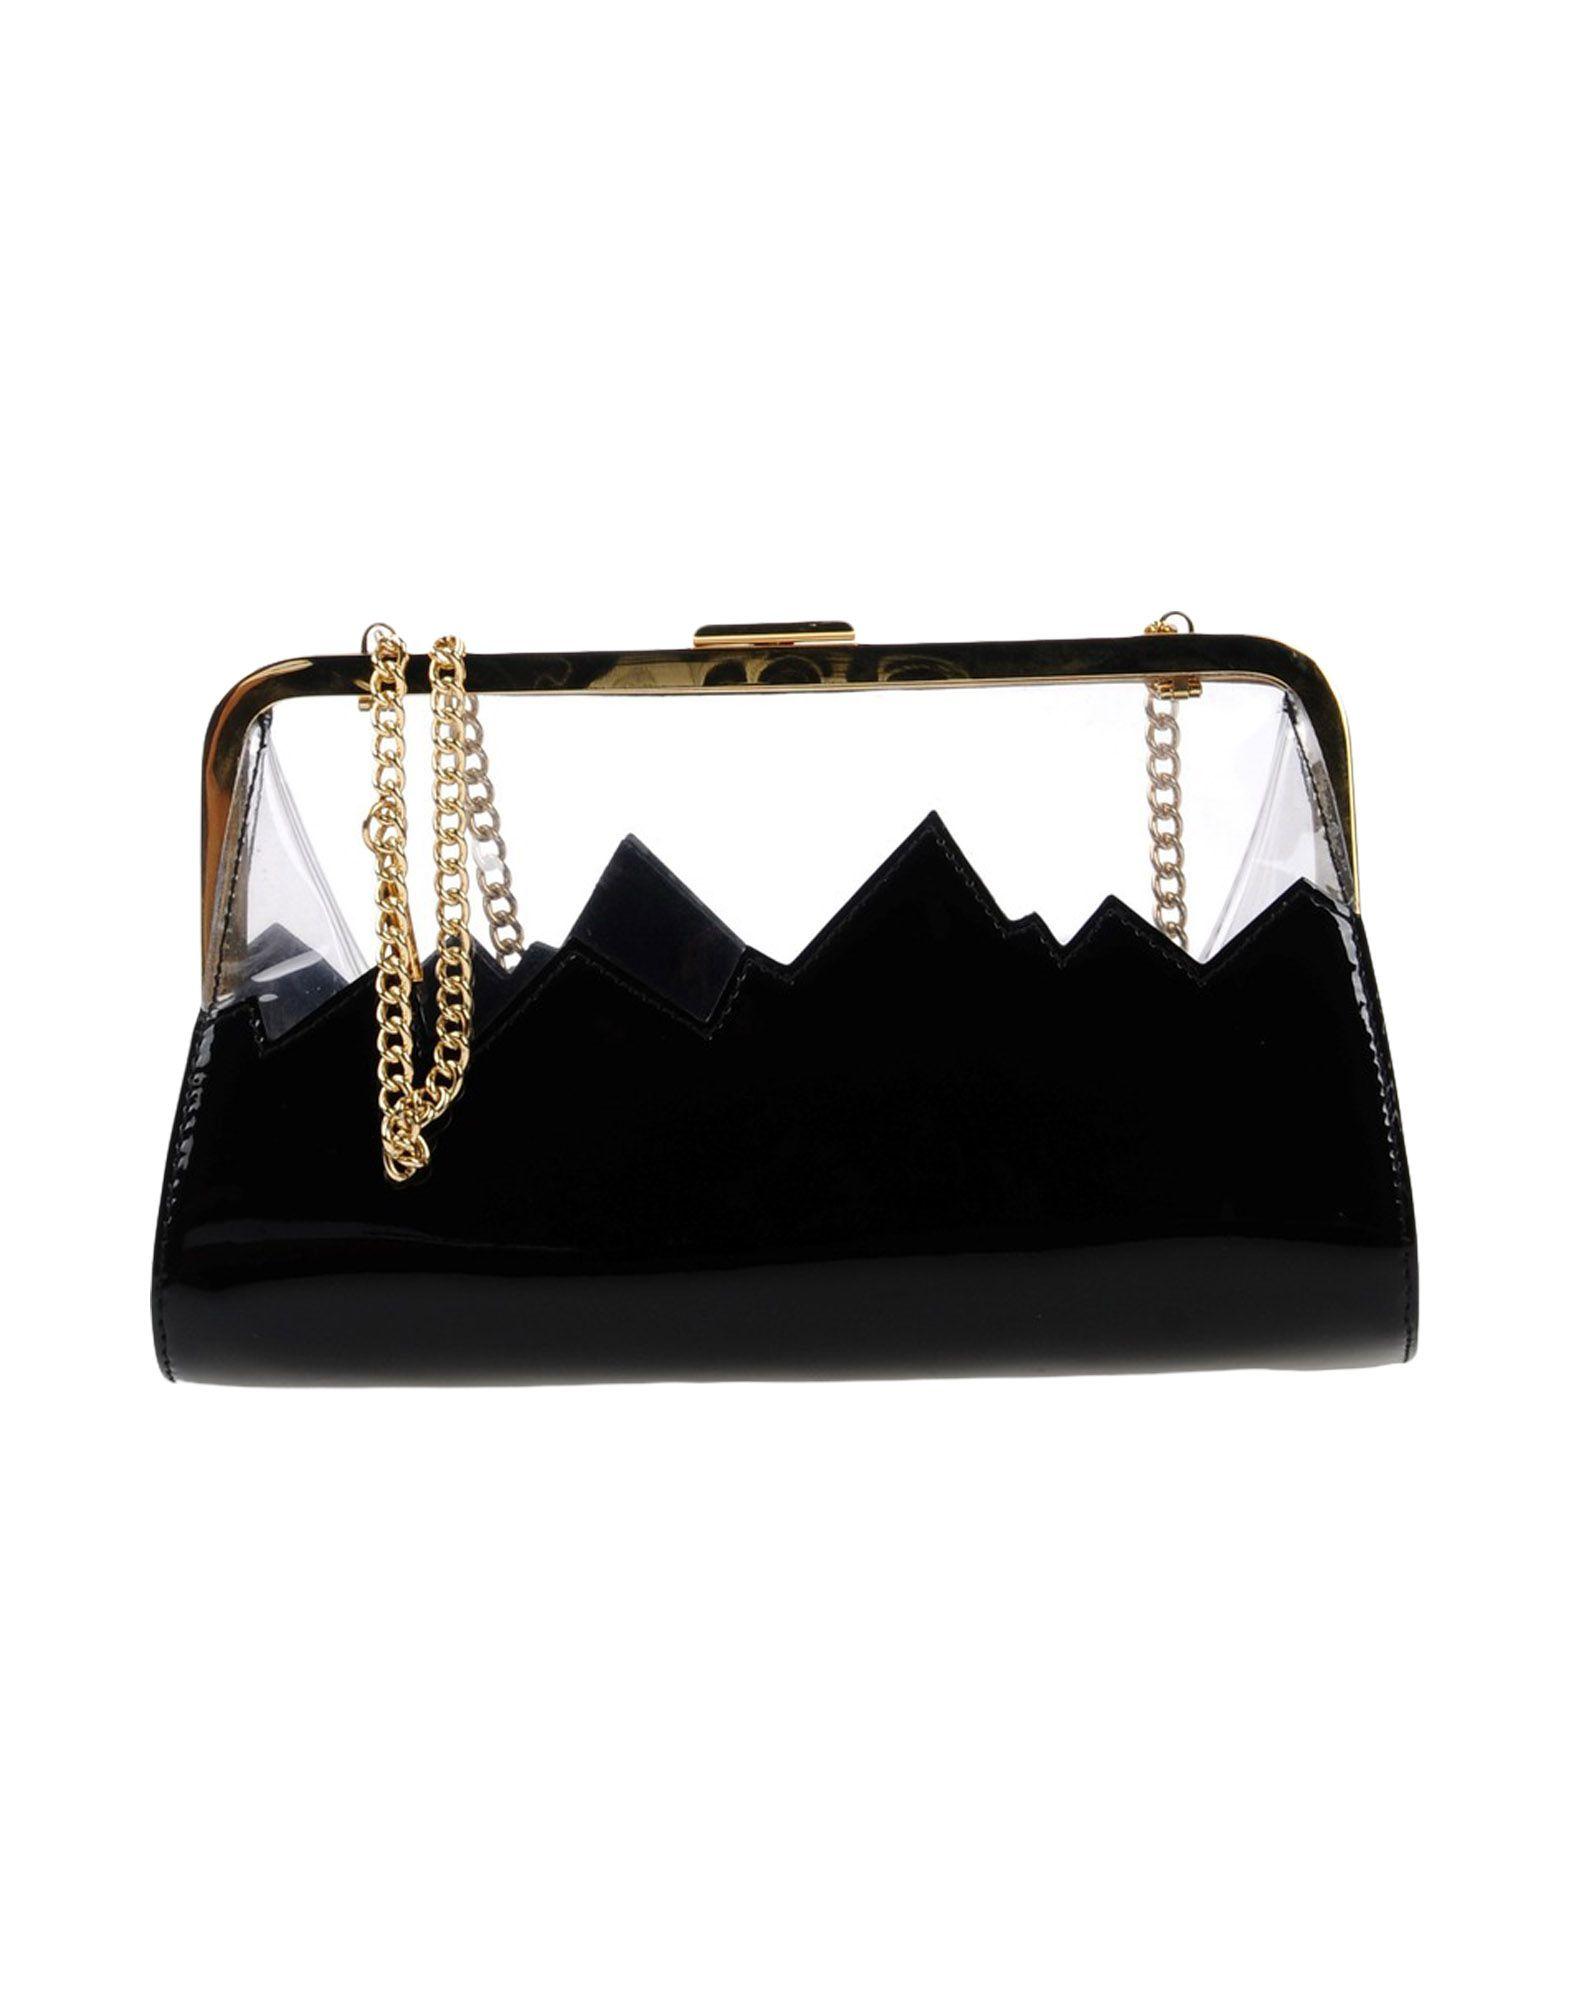 MOSCHINO CHEAP AND CHIC Handbag in Black